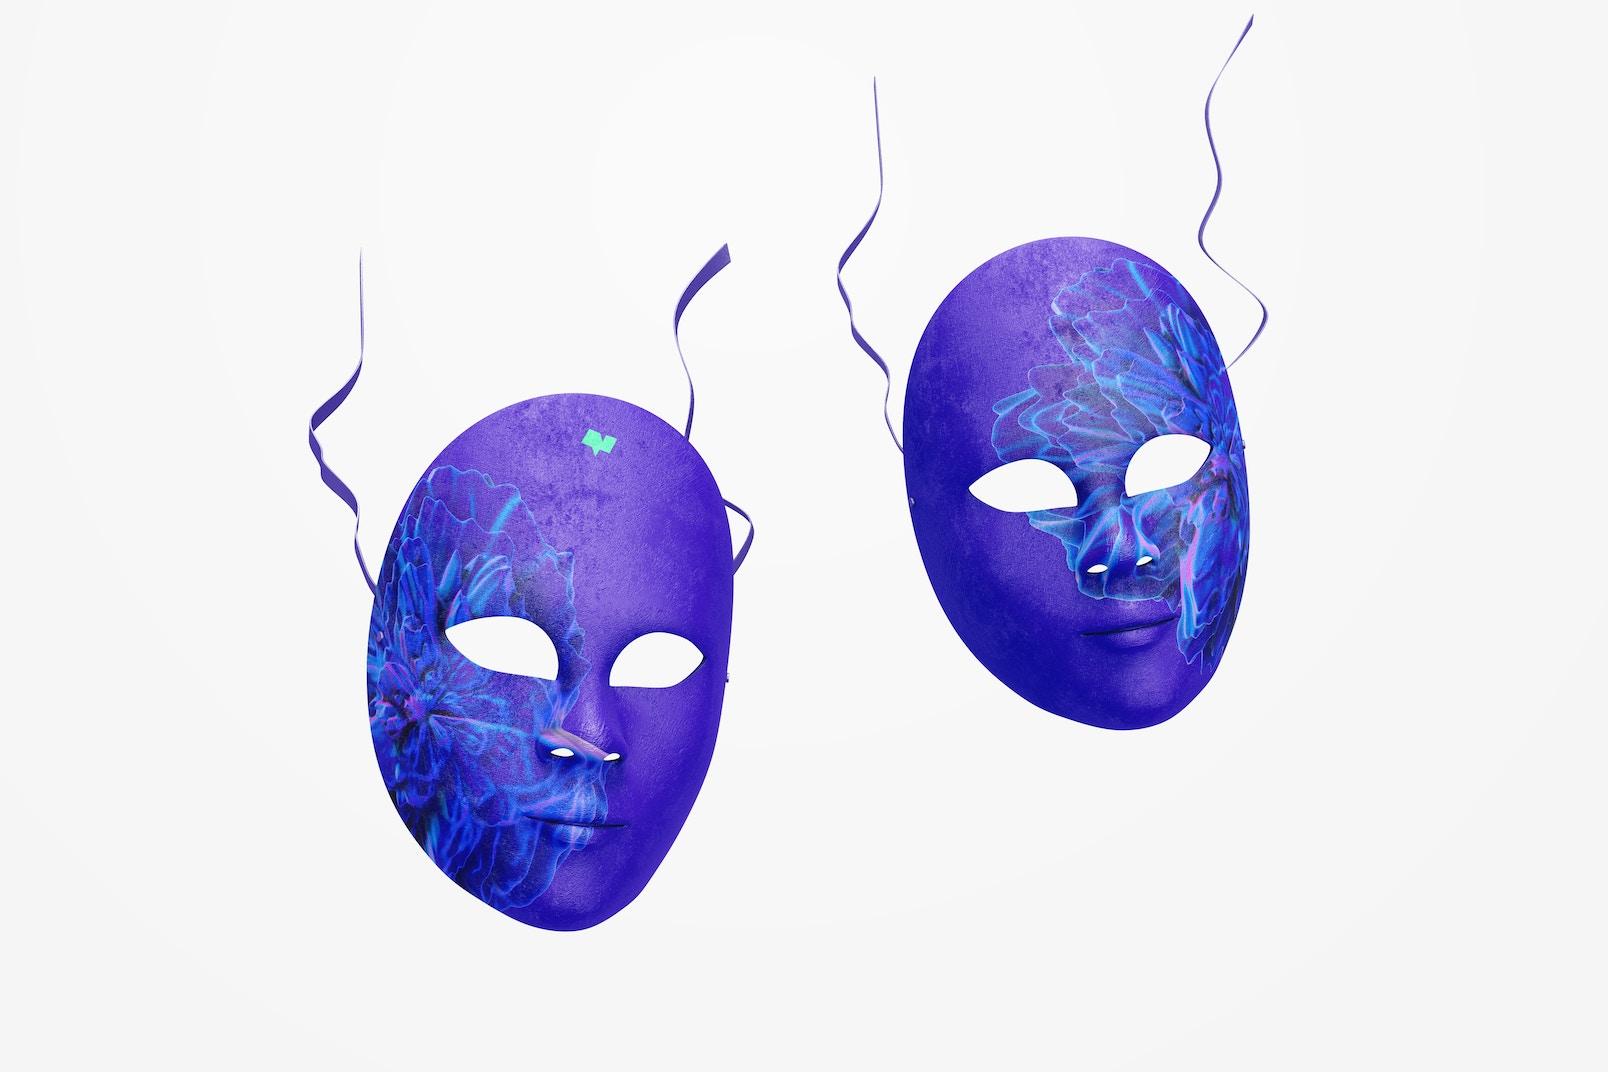 Plain Venetian Full-Face Masks Mockup, Falling